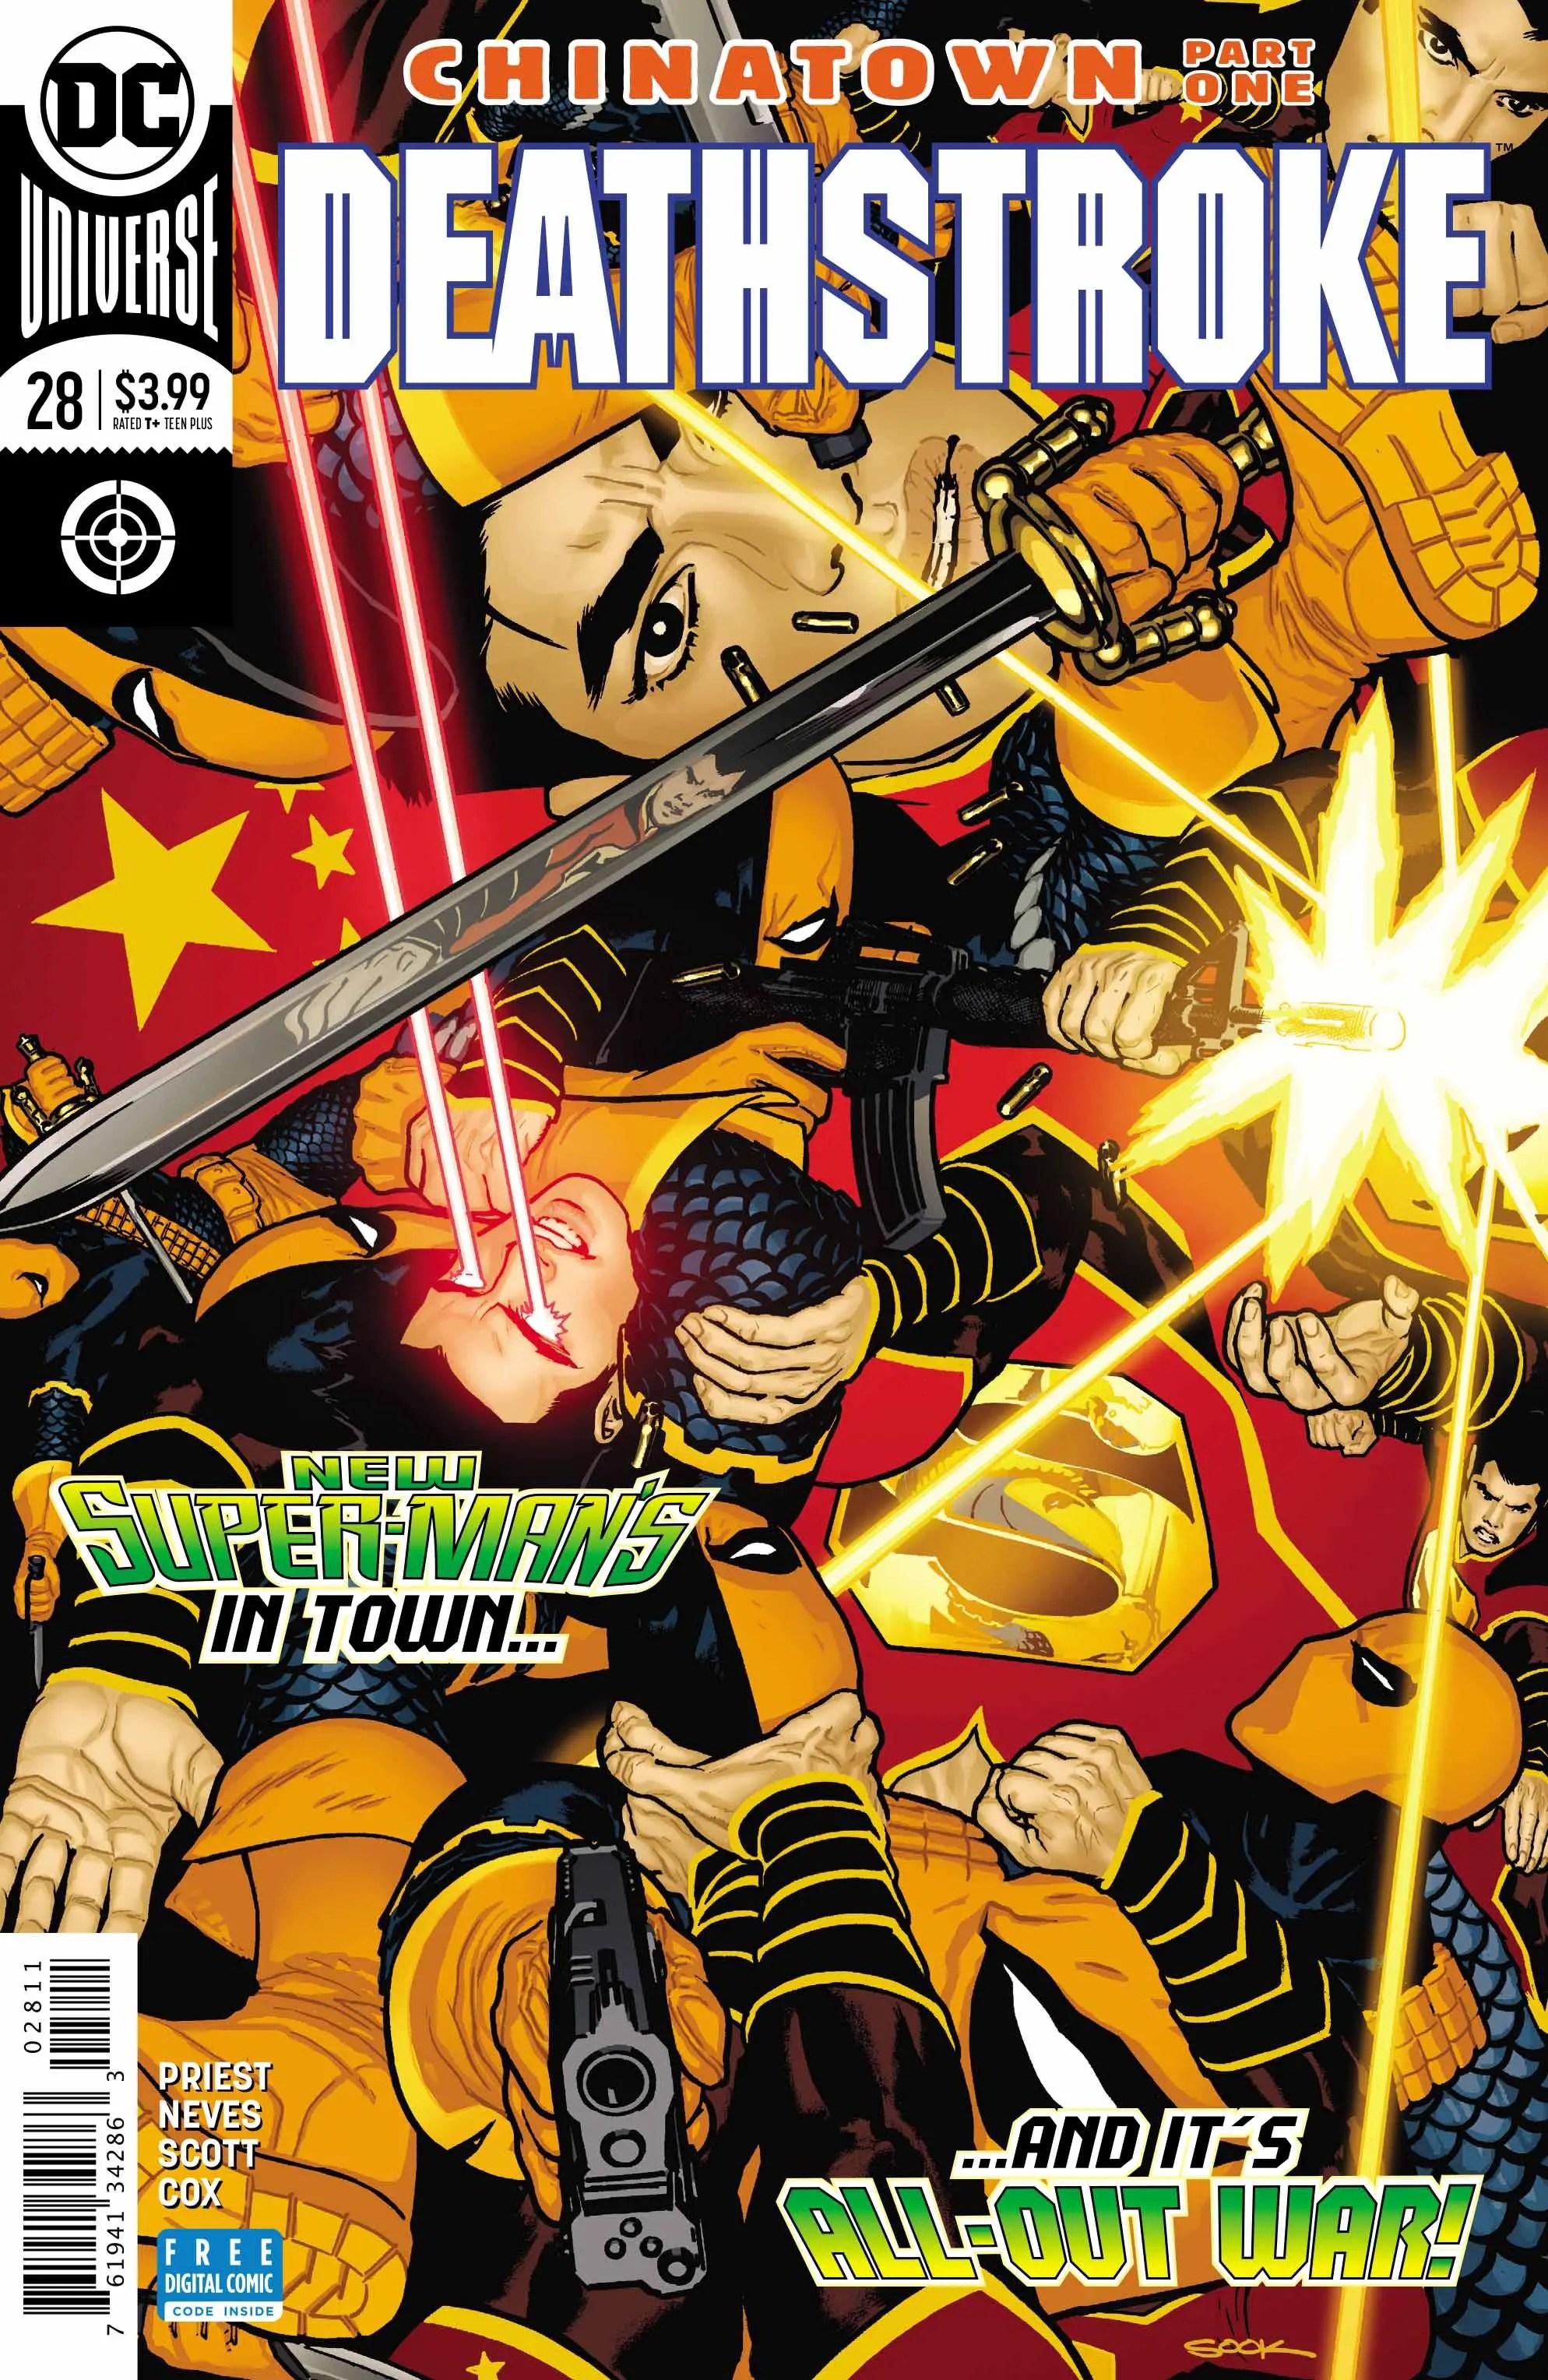 Deathstroke #28 Review